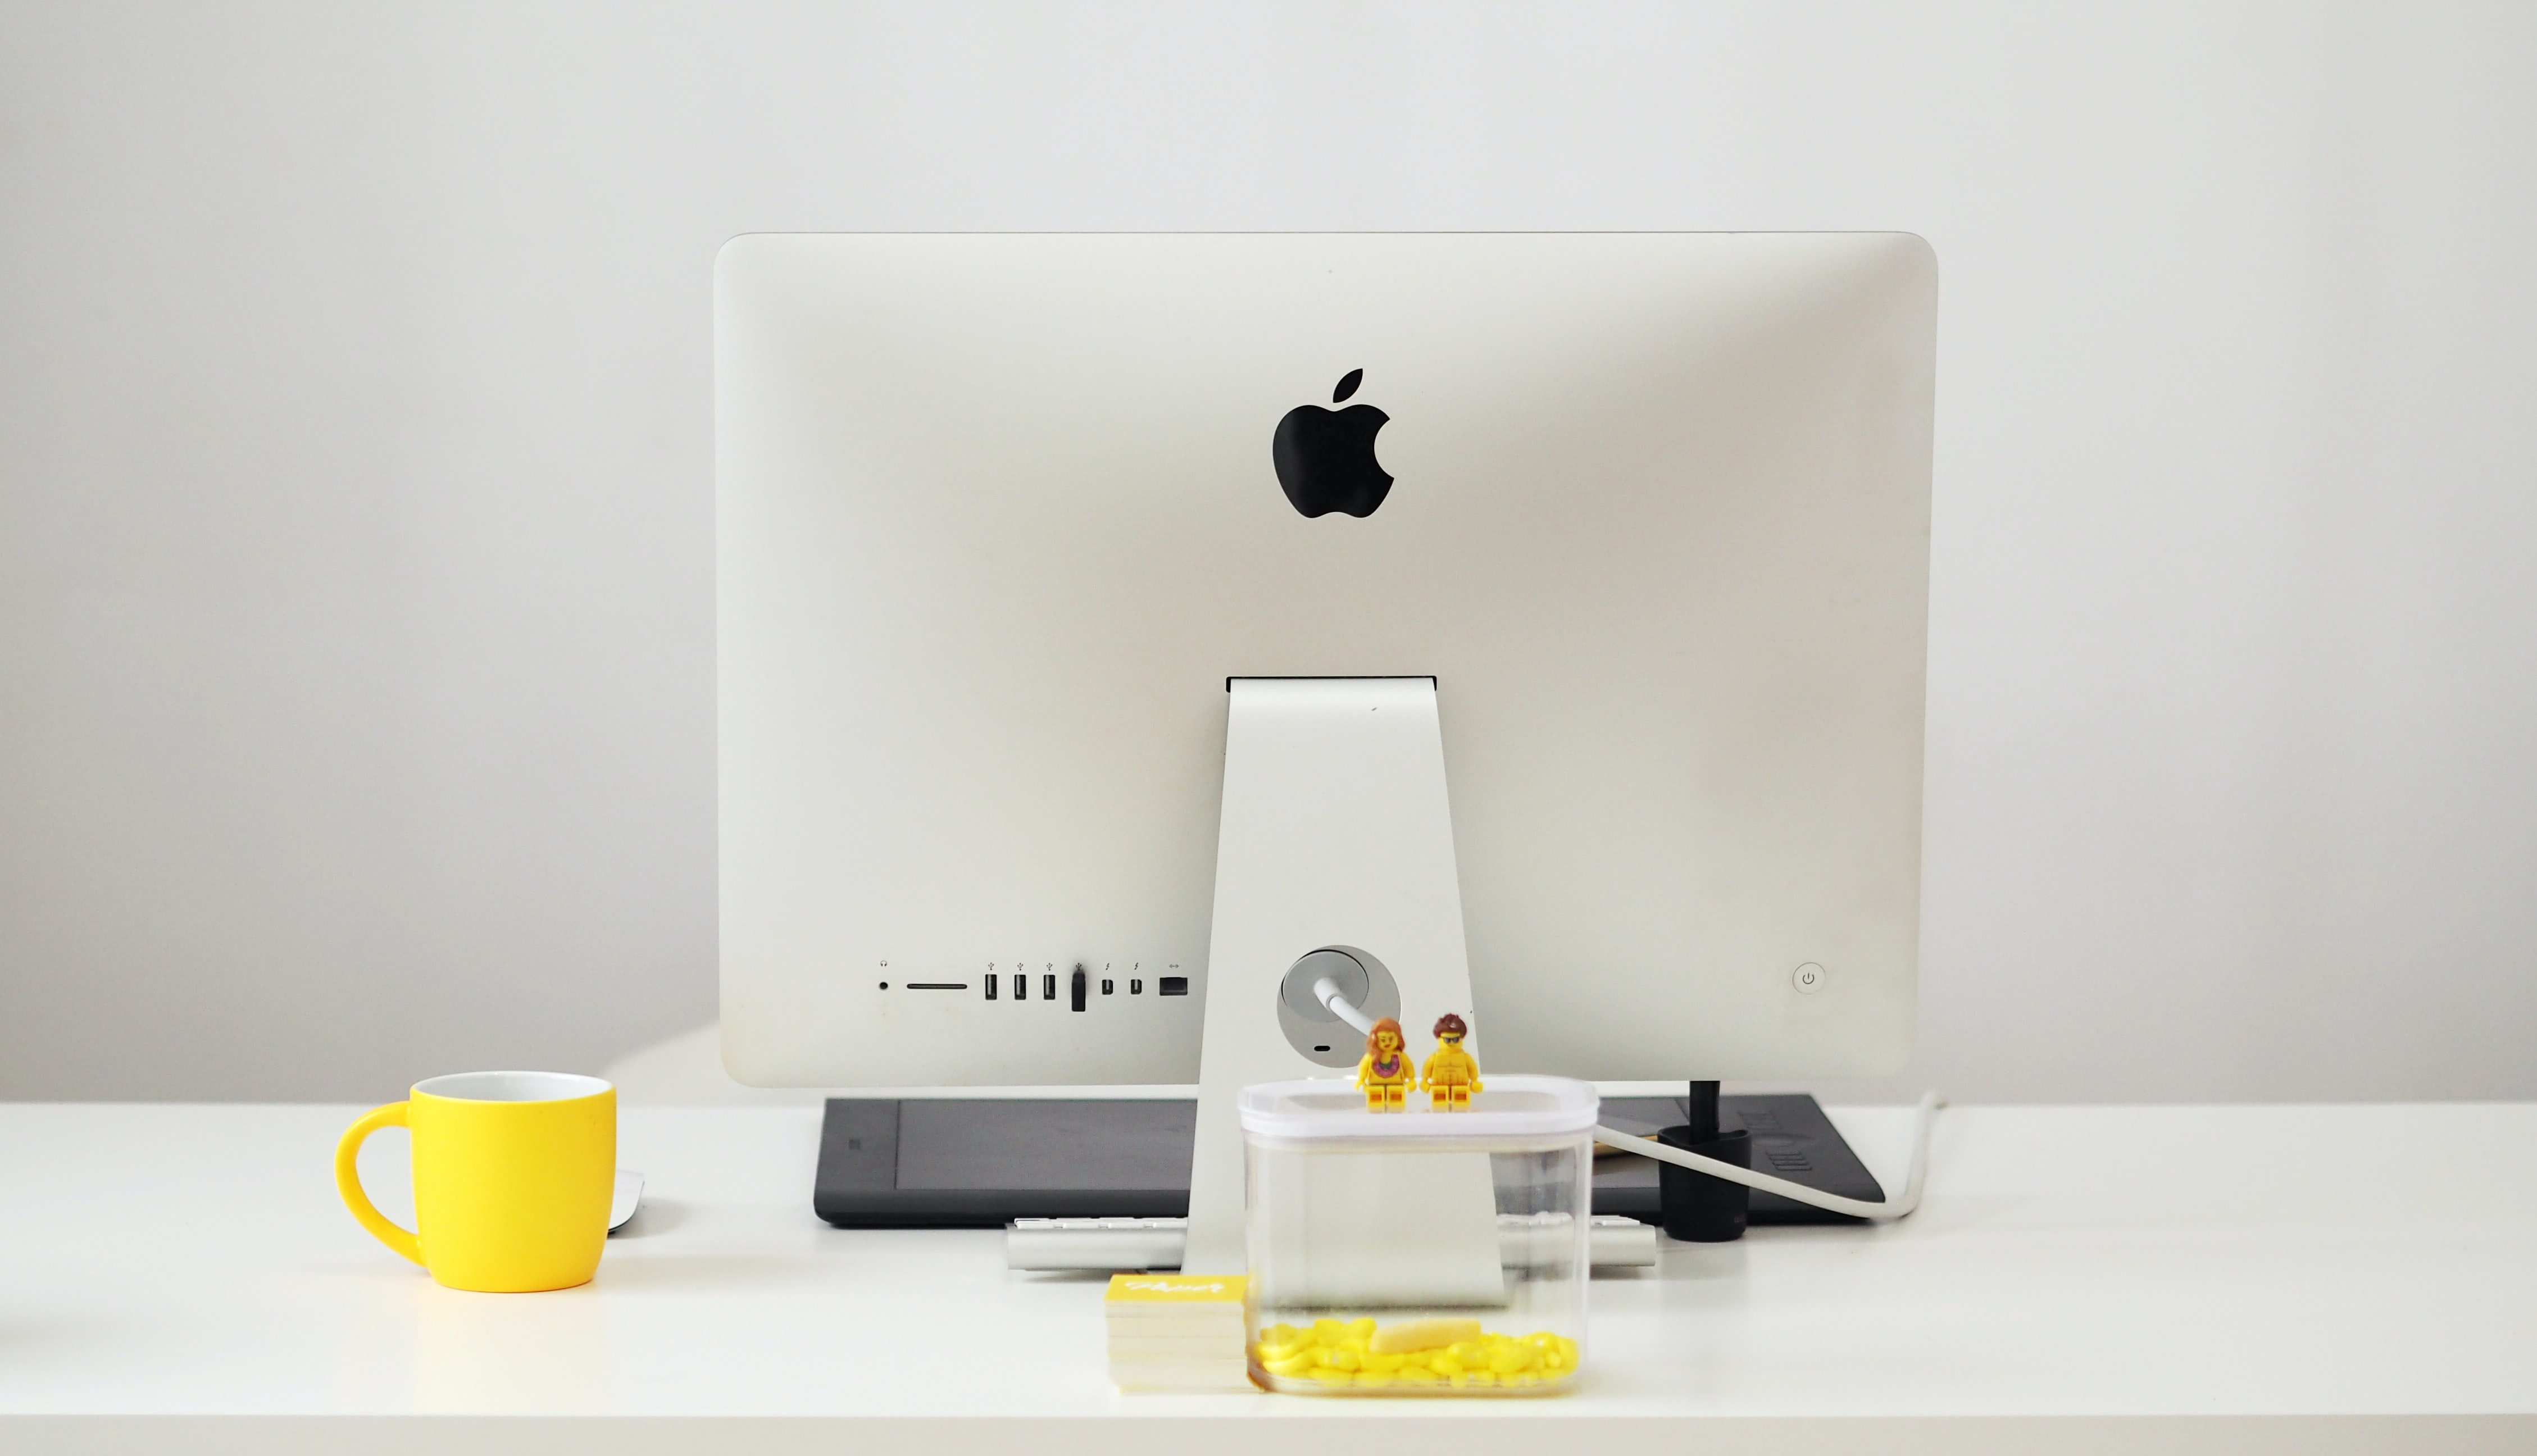 silver iMac beside yellow mug